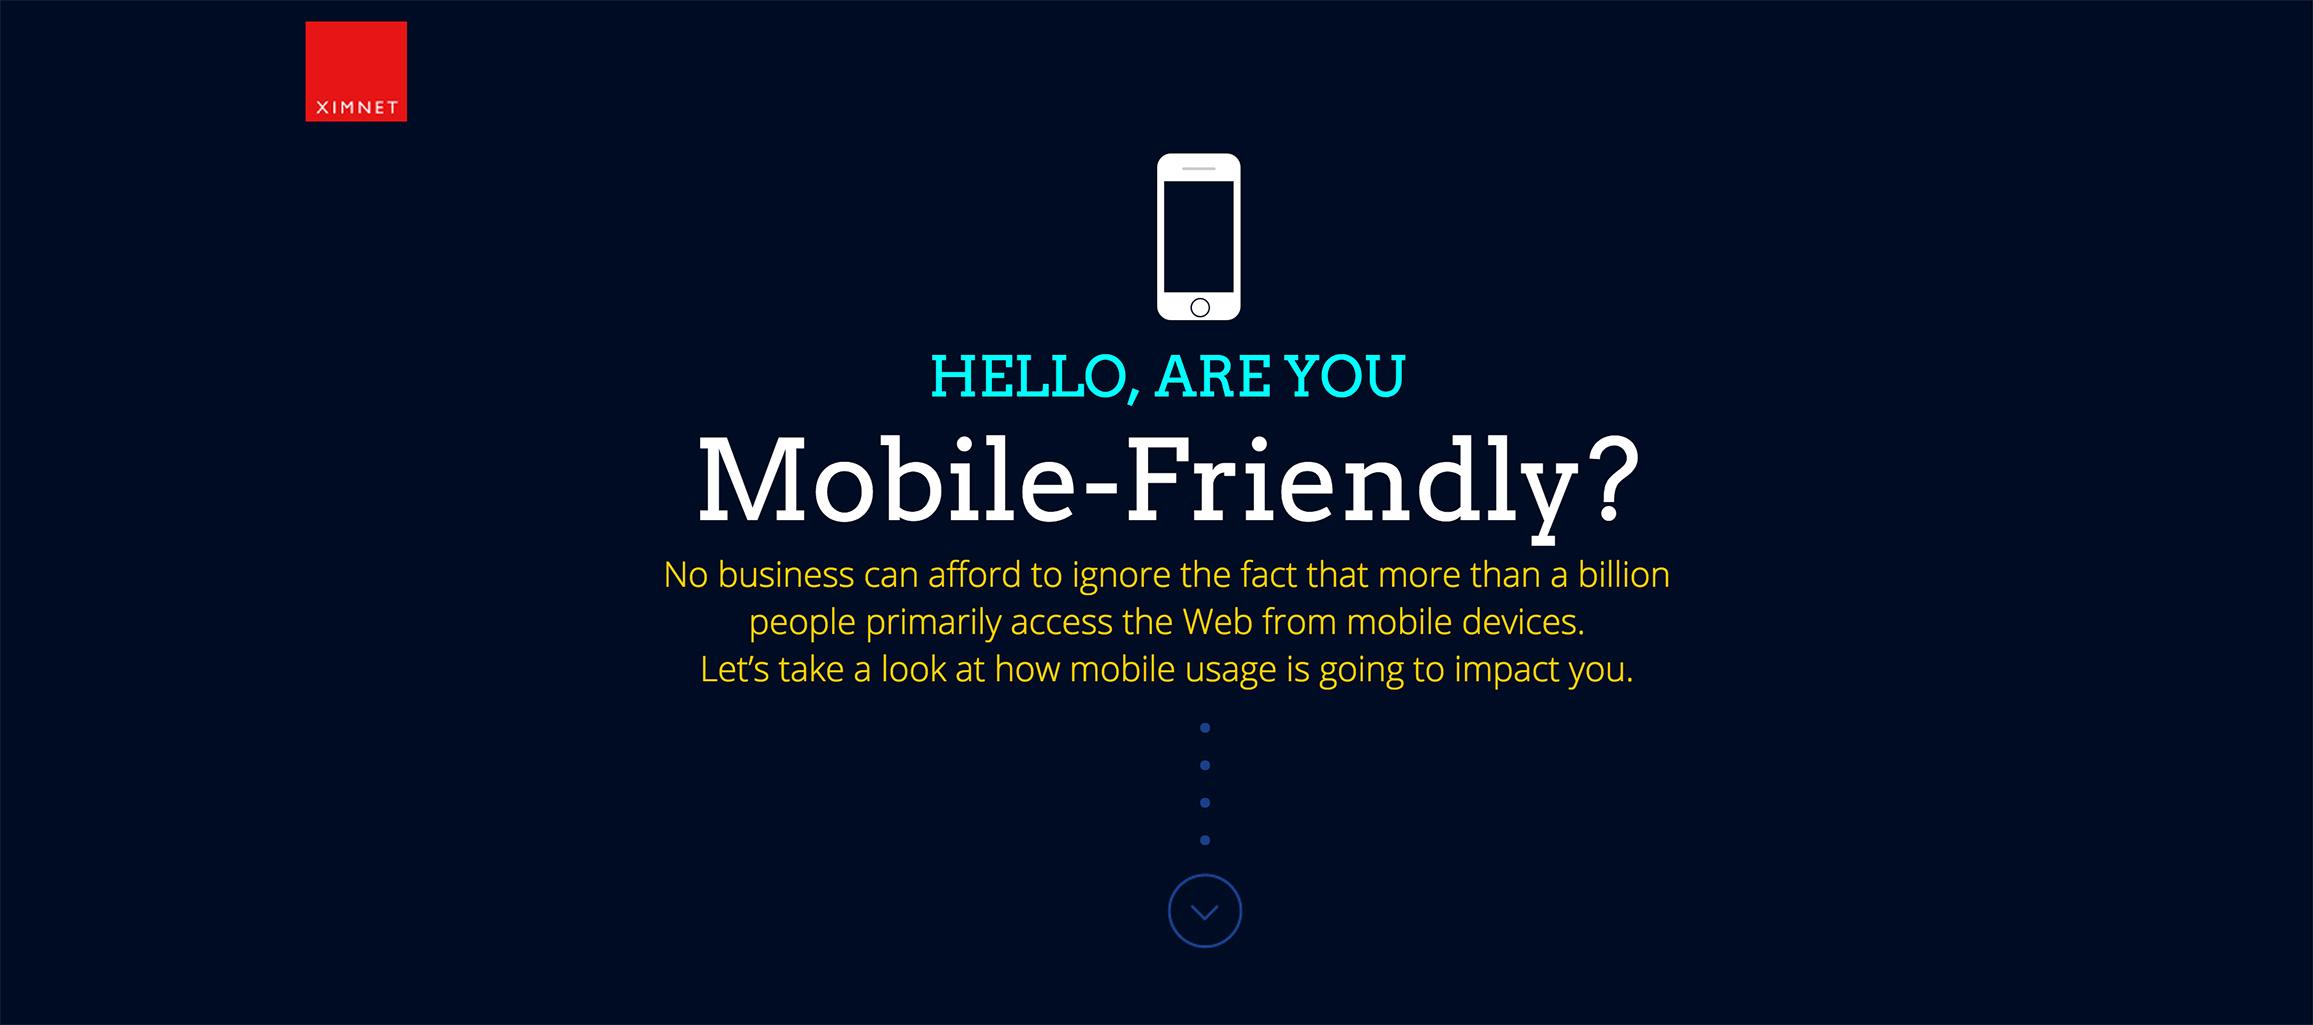 Mobile-Friendly 101